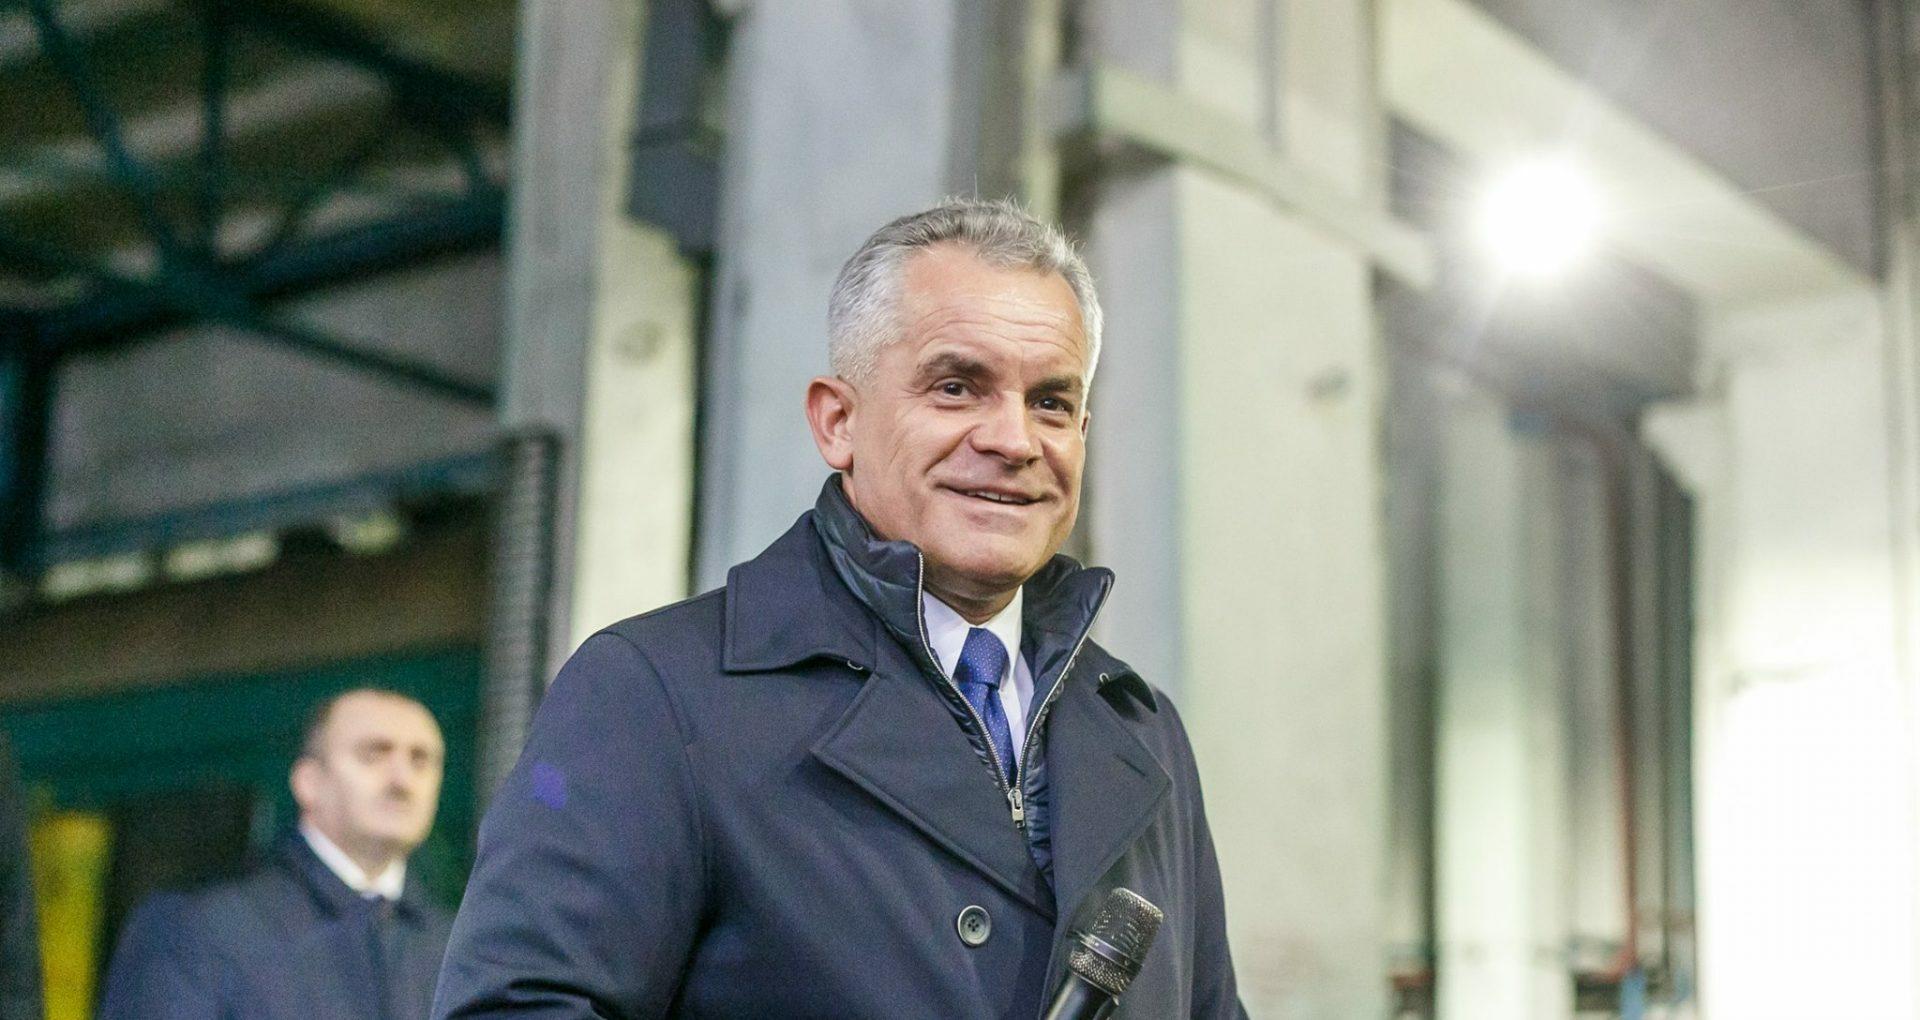 Half a Million Euros Belonging to the Runaway Oligarch Vladimir Plahotniuc Seized in the Billion-Dollar Bank Fraud Case